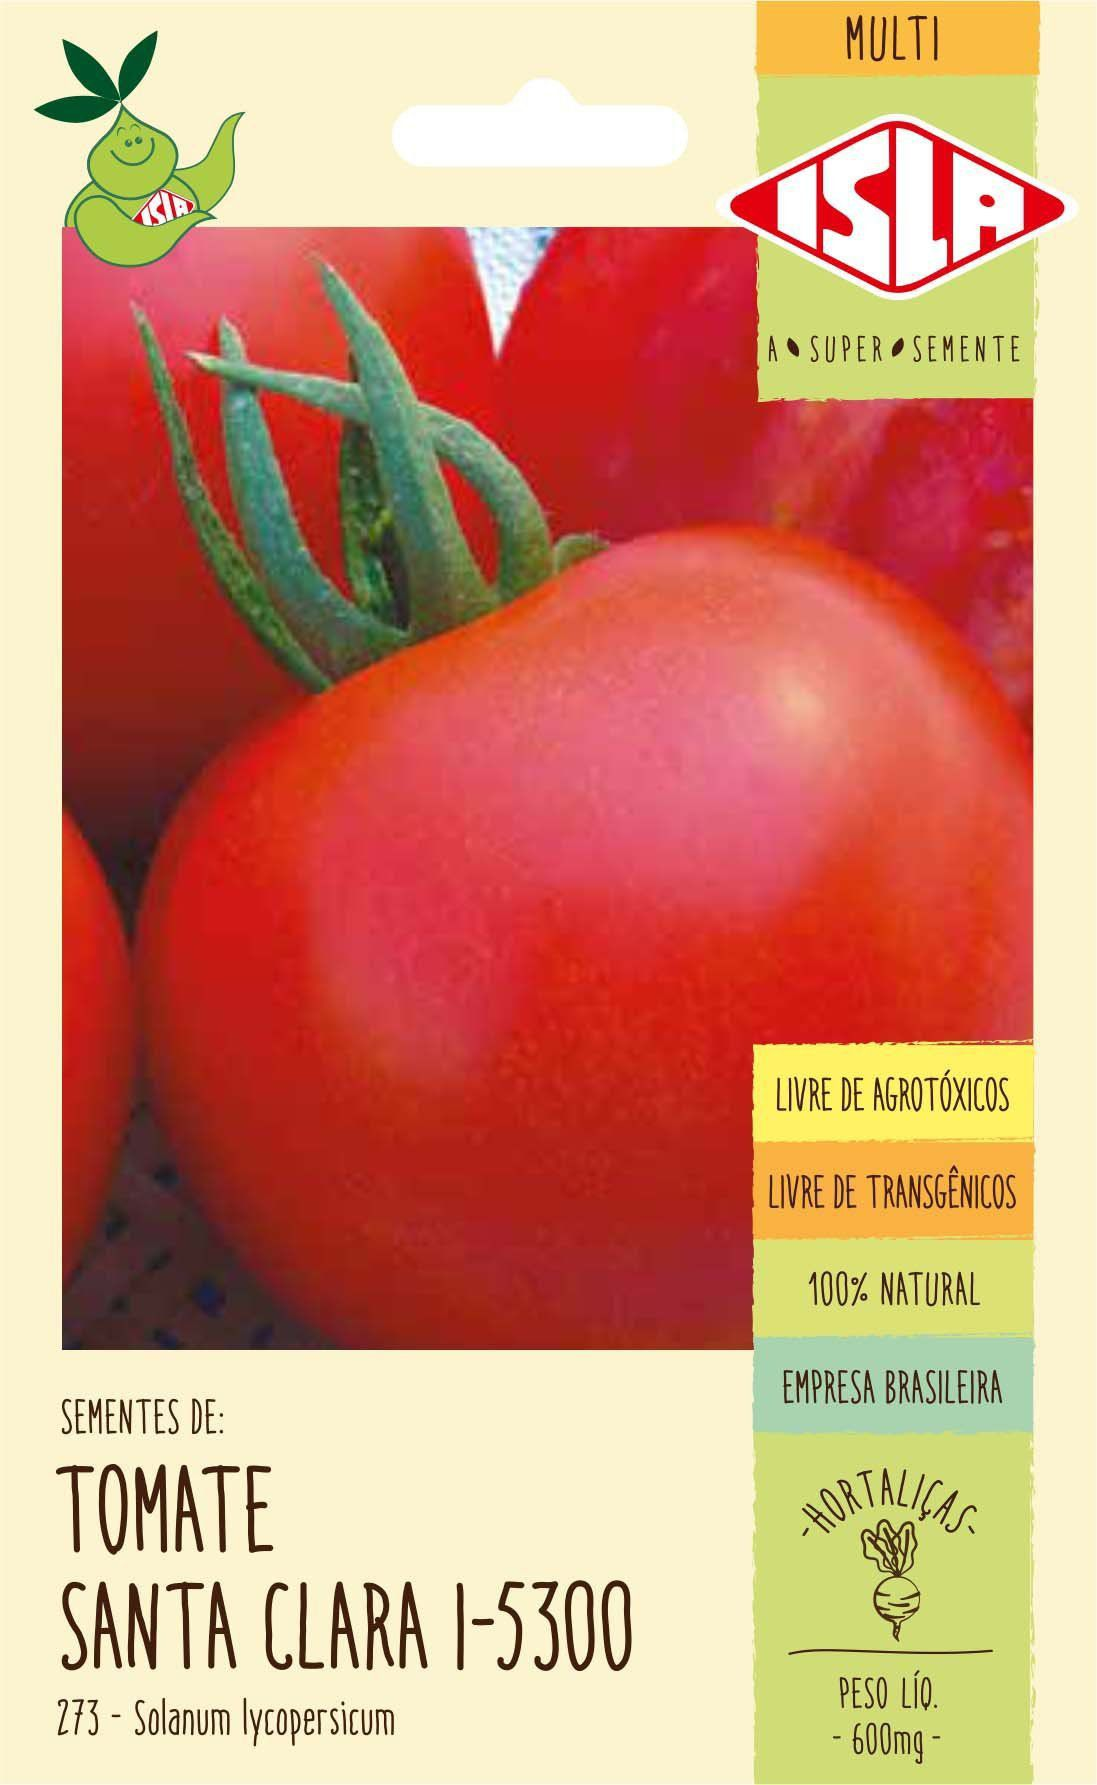 Sementes de Tomate Santa Clara I-5300 - Isla Multi